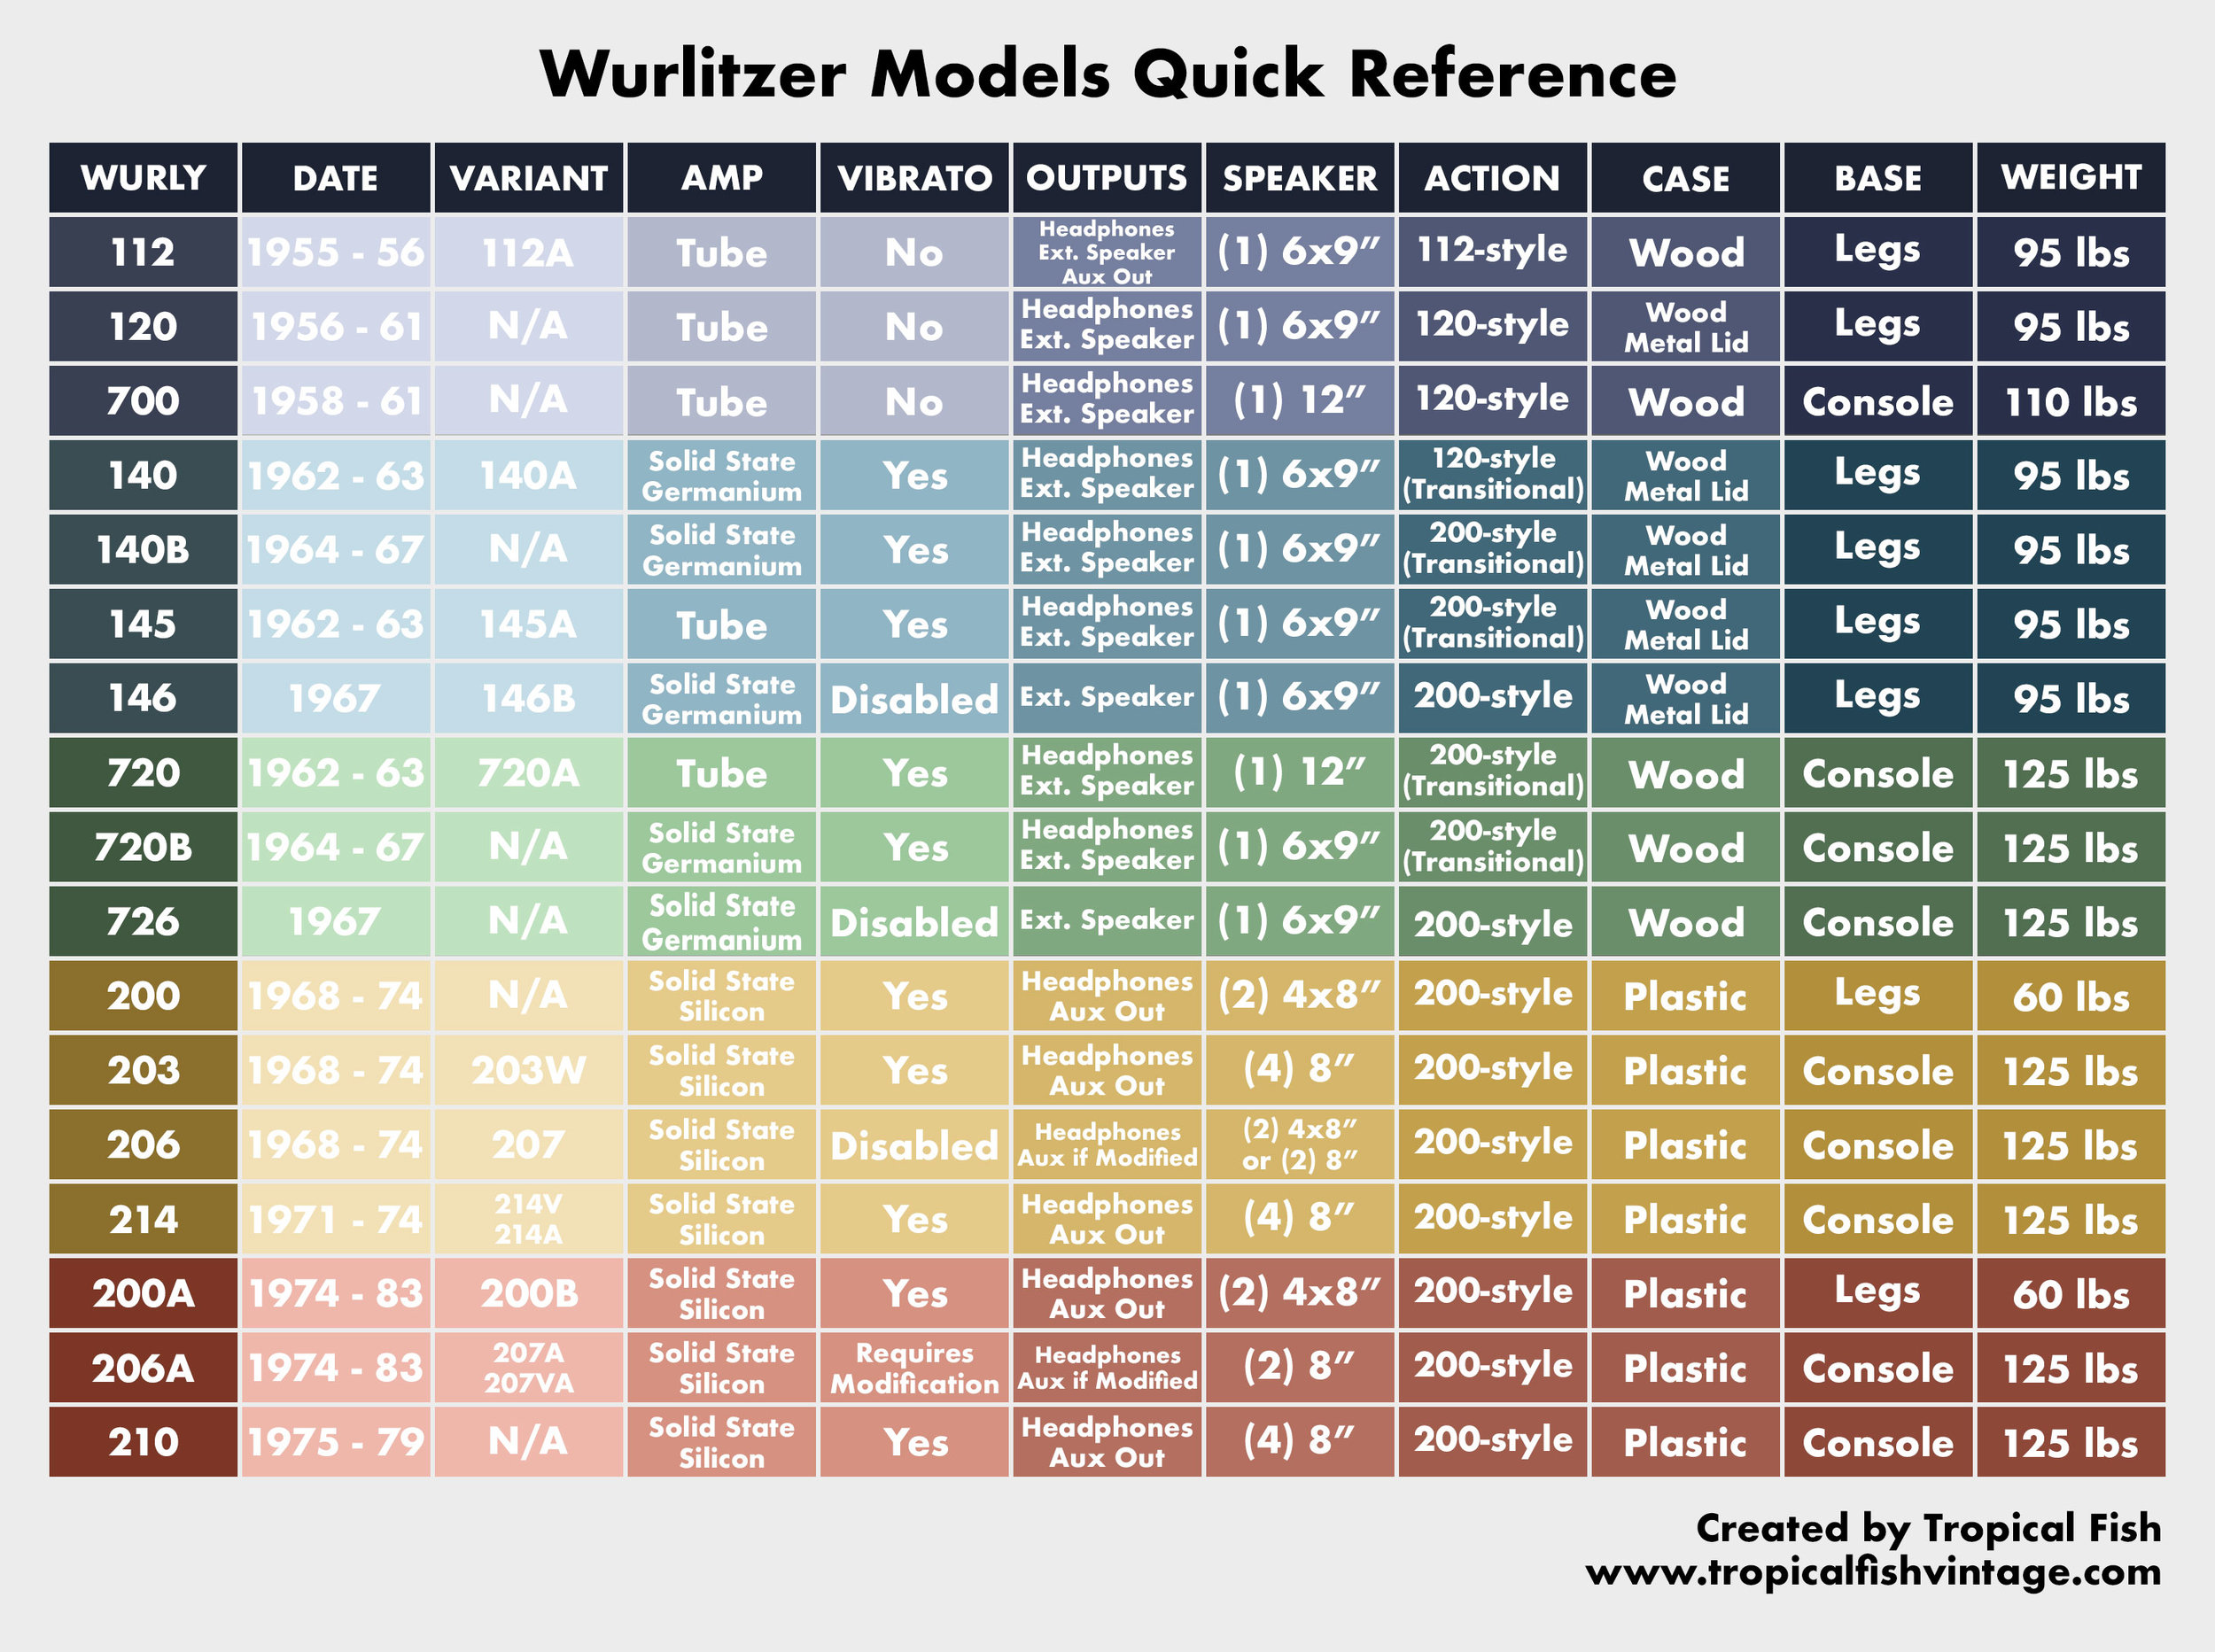 Wurlitzer-models-quick-reference.jpg